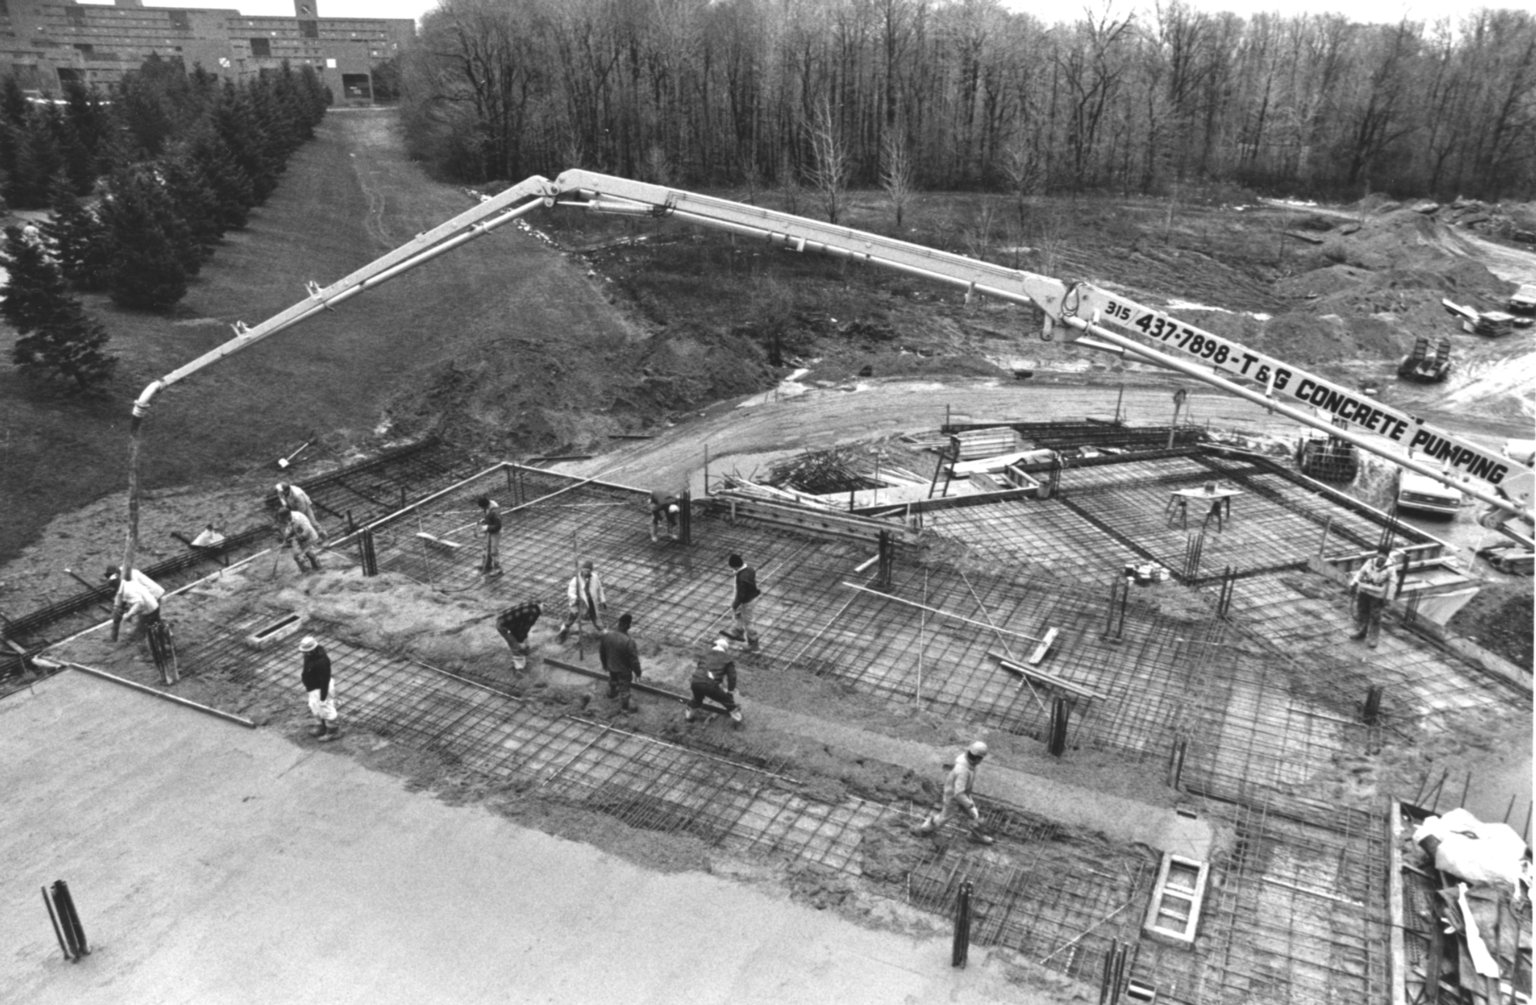 Pouring Concrete at the Kilian J. and Caroline F. Schmitt Interfaith Center Construction Site